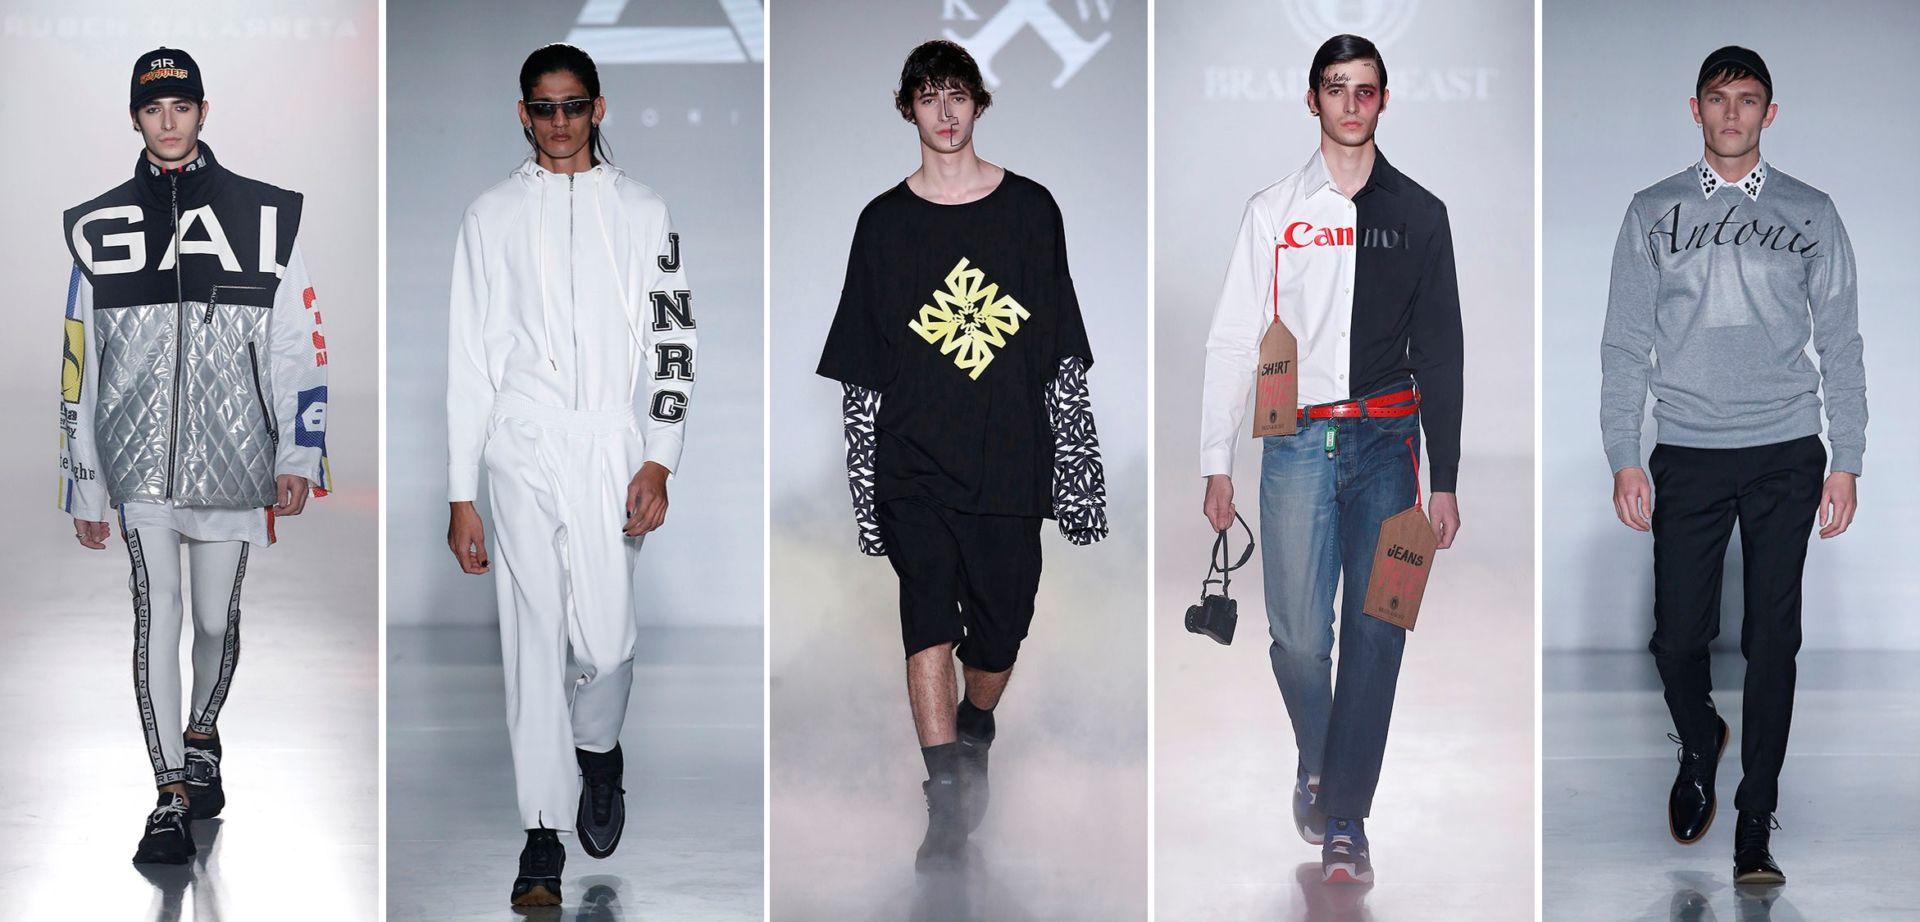 Tendencias Moda Masculina AW 20192020 #080BCNFashion